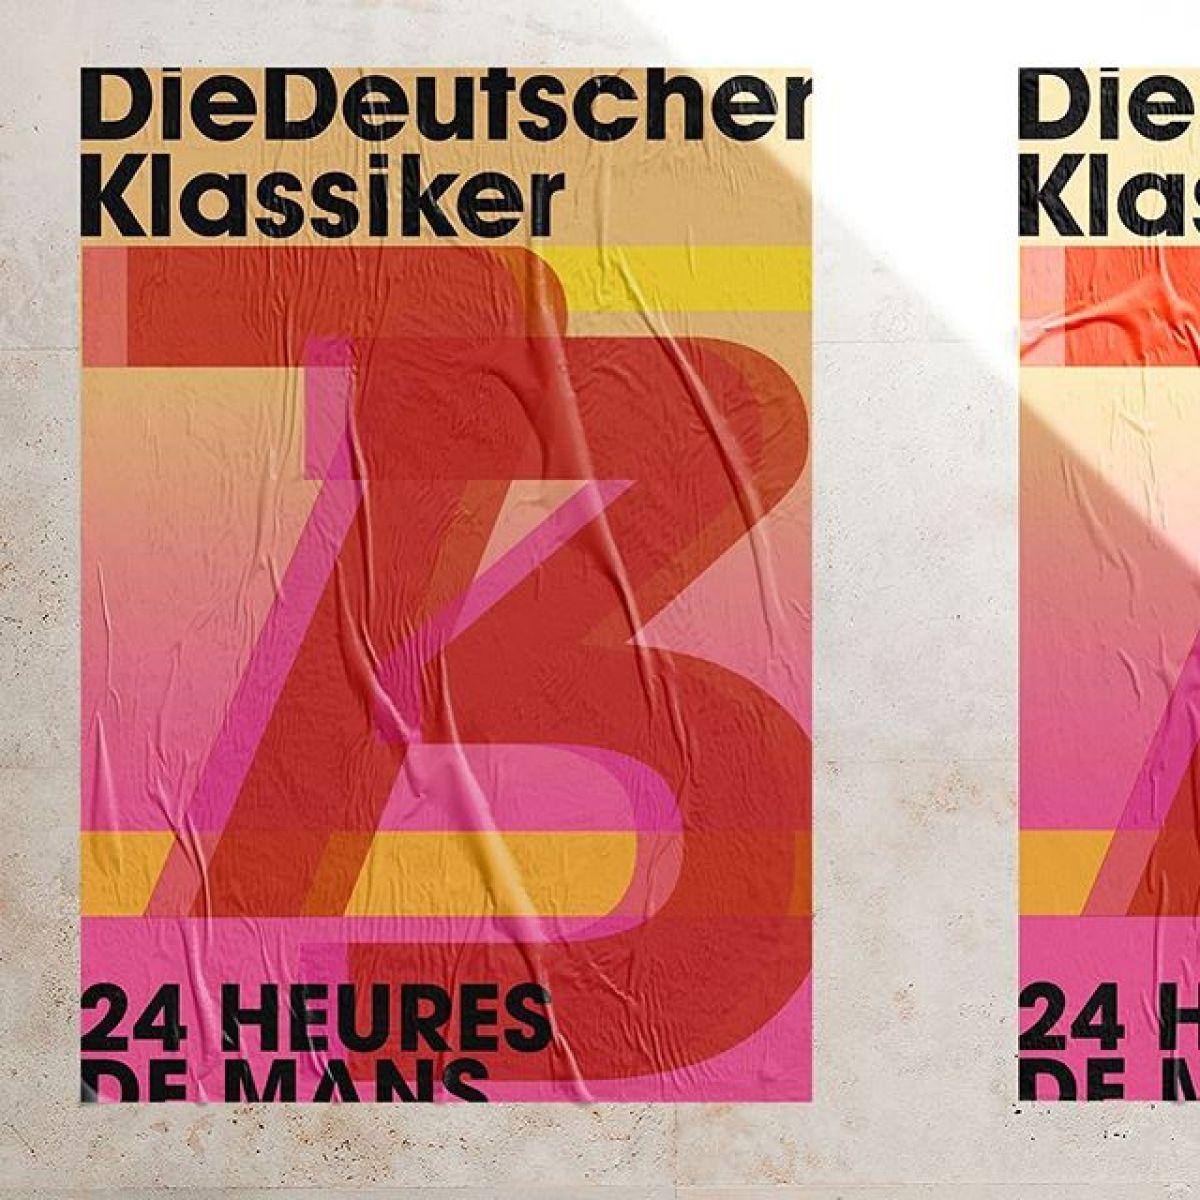 Archive work — Poster.Le Mans - Porsche.#poster #art #artistsoninstagram #artofvisuals #artoftheday #artofinstagram #logo #logos #logodesigner #logodesign #design #designer #designagency #london #dorset #identity #branding #brand #agency #graphicdesign #graphicdesigner #brandingagency